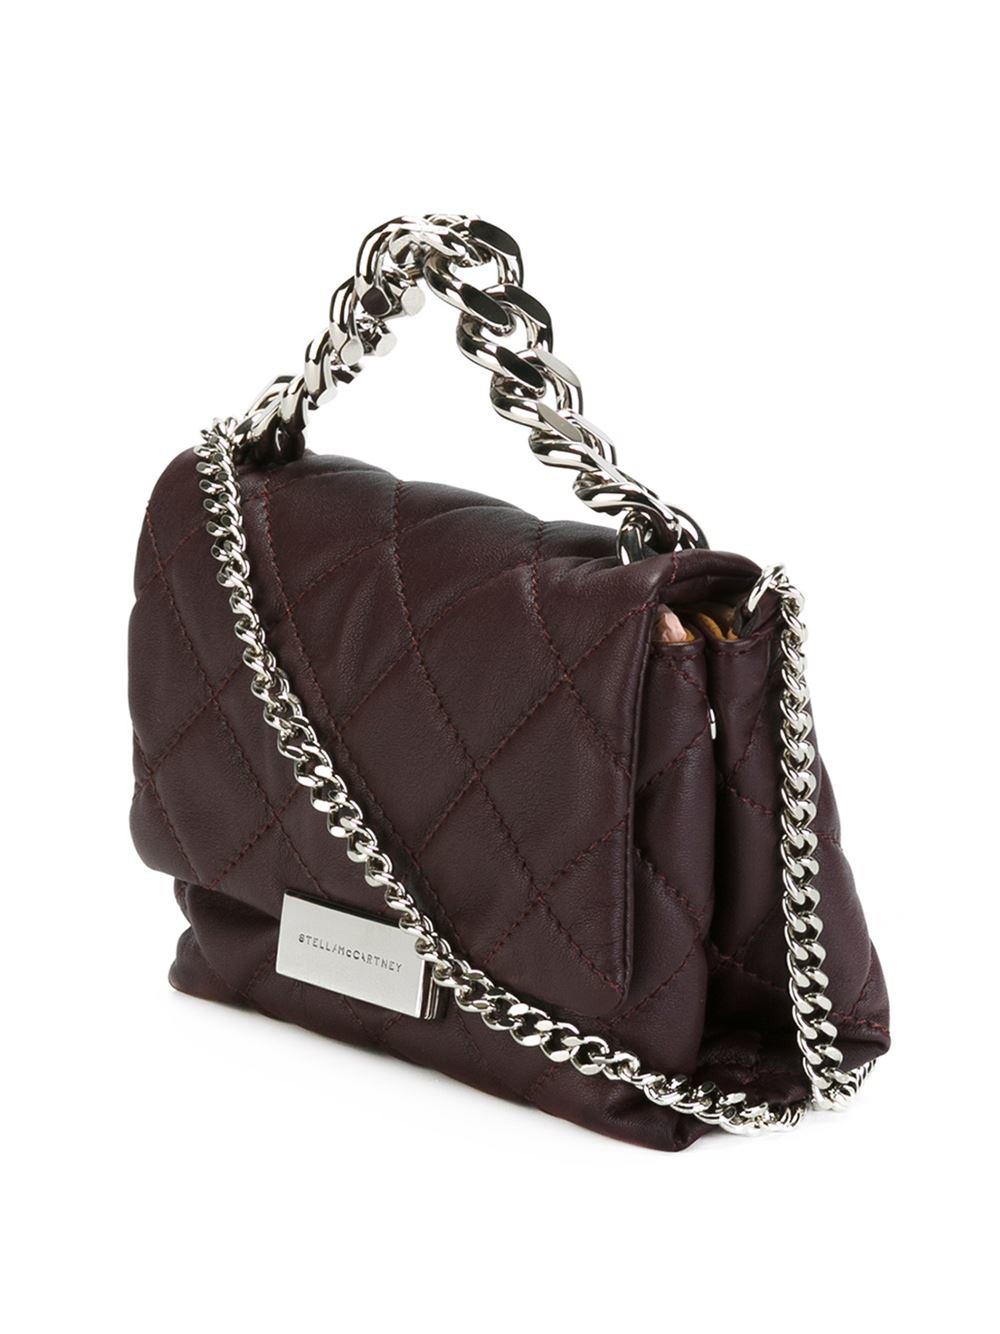 stella mccartney small 39 beckett 39 shoulder bag in purple pink purple lyst. Black Bedroom Furniture Sets. Home Design Ideas